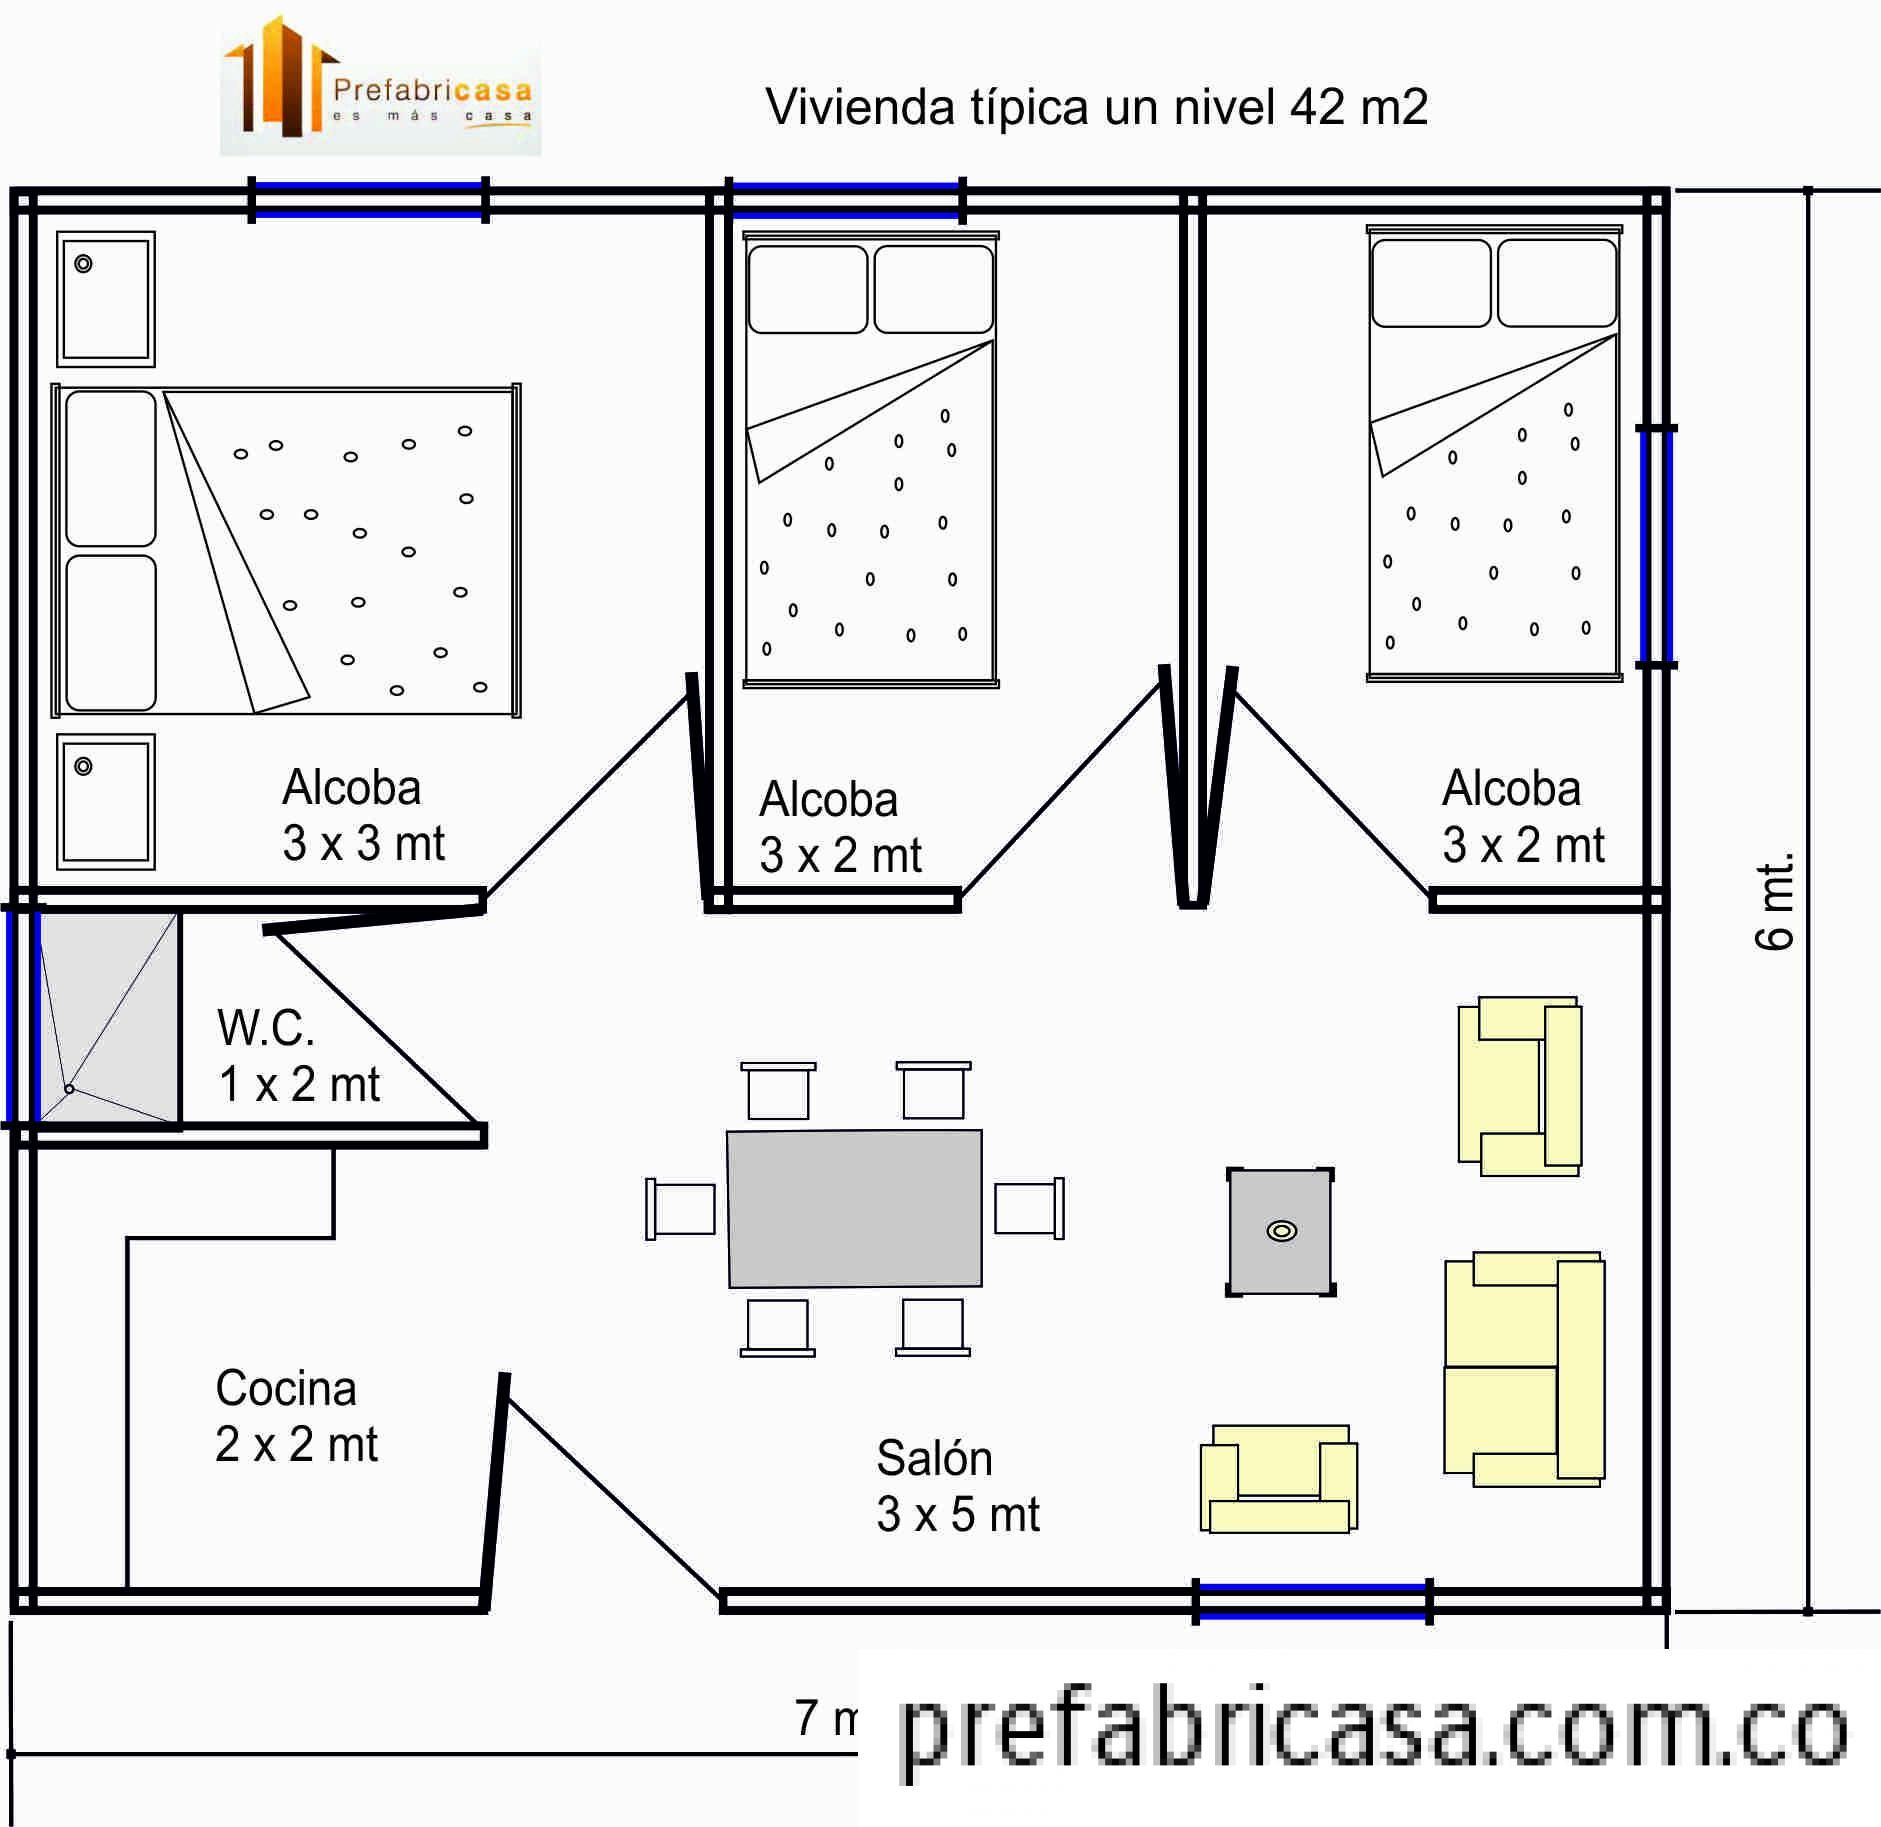 Resultado de imagen para alcobas peque as con ba o para for Disenos y planos de casas prefabricadas